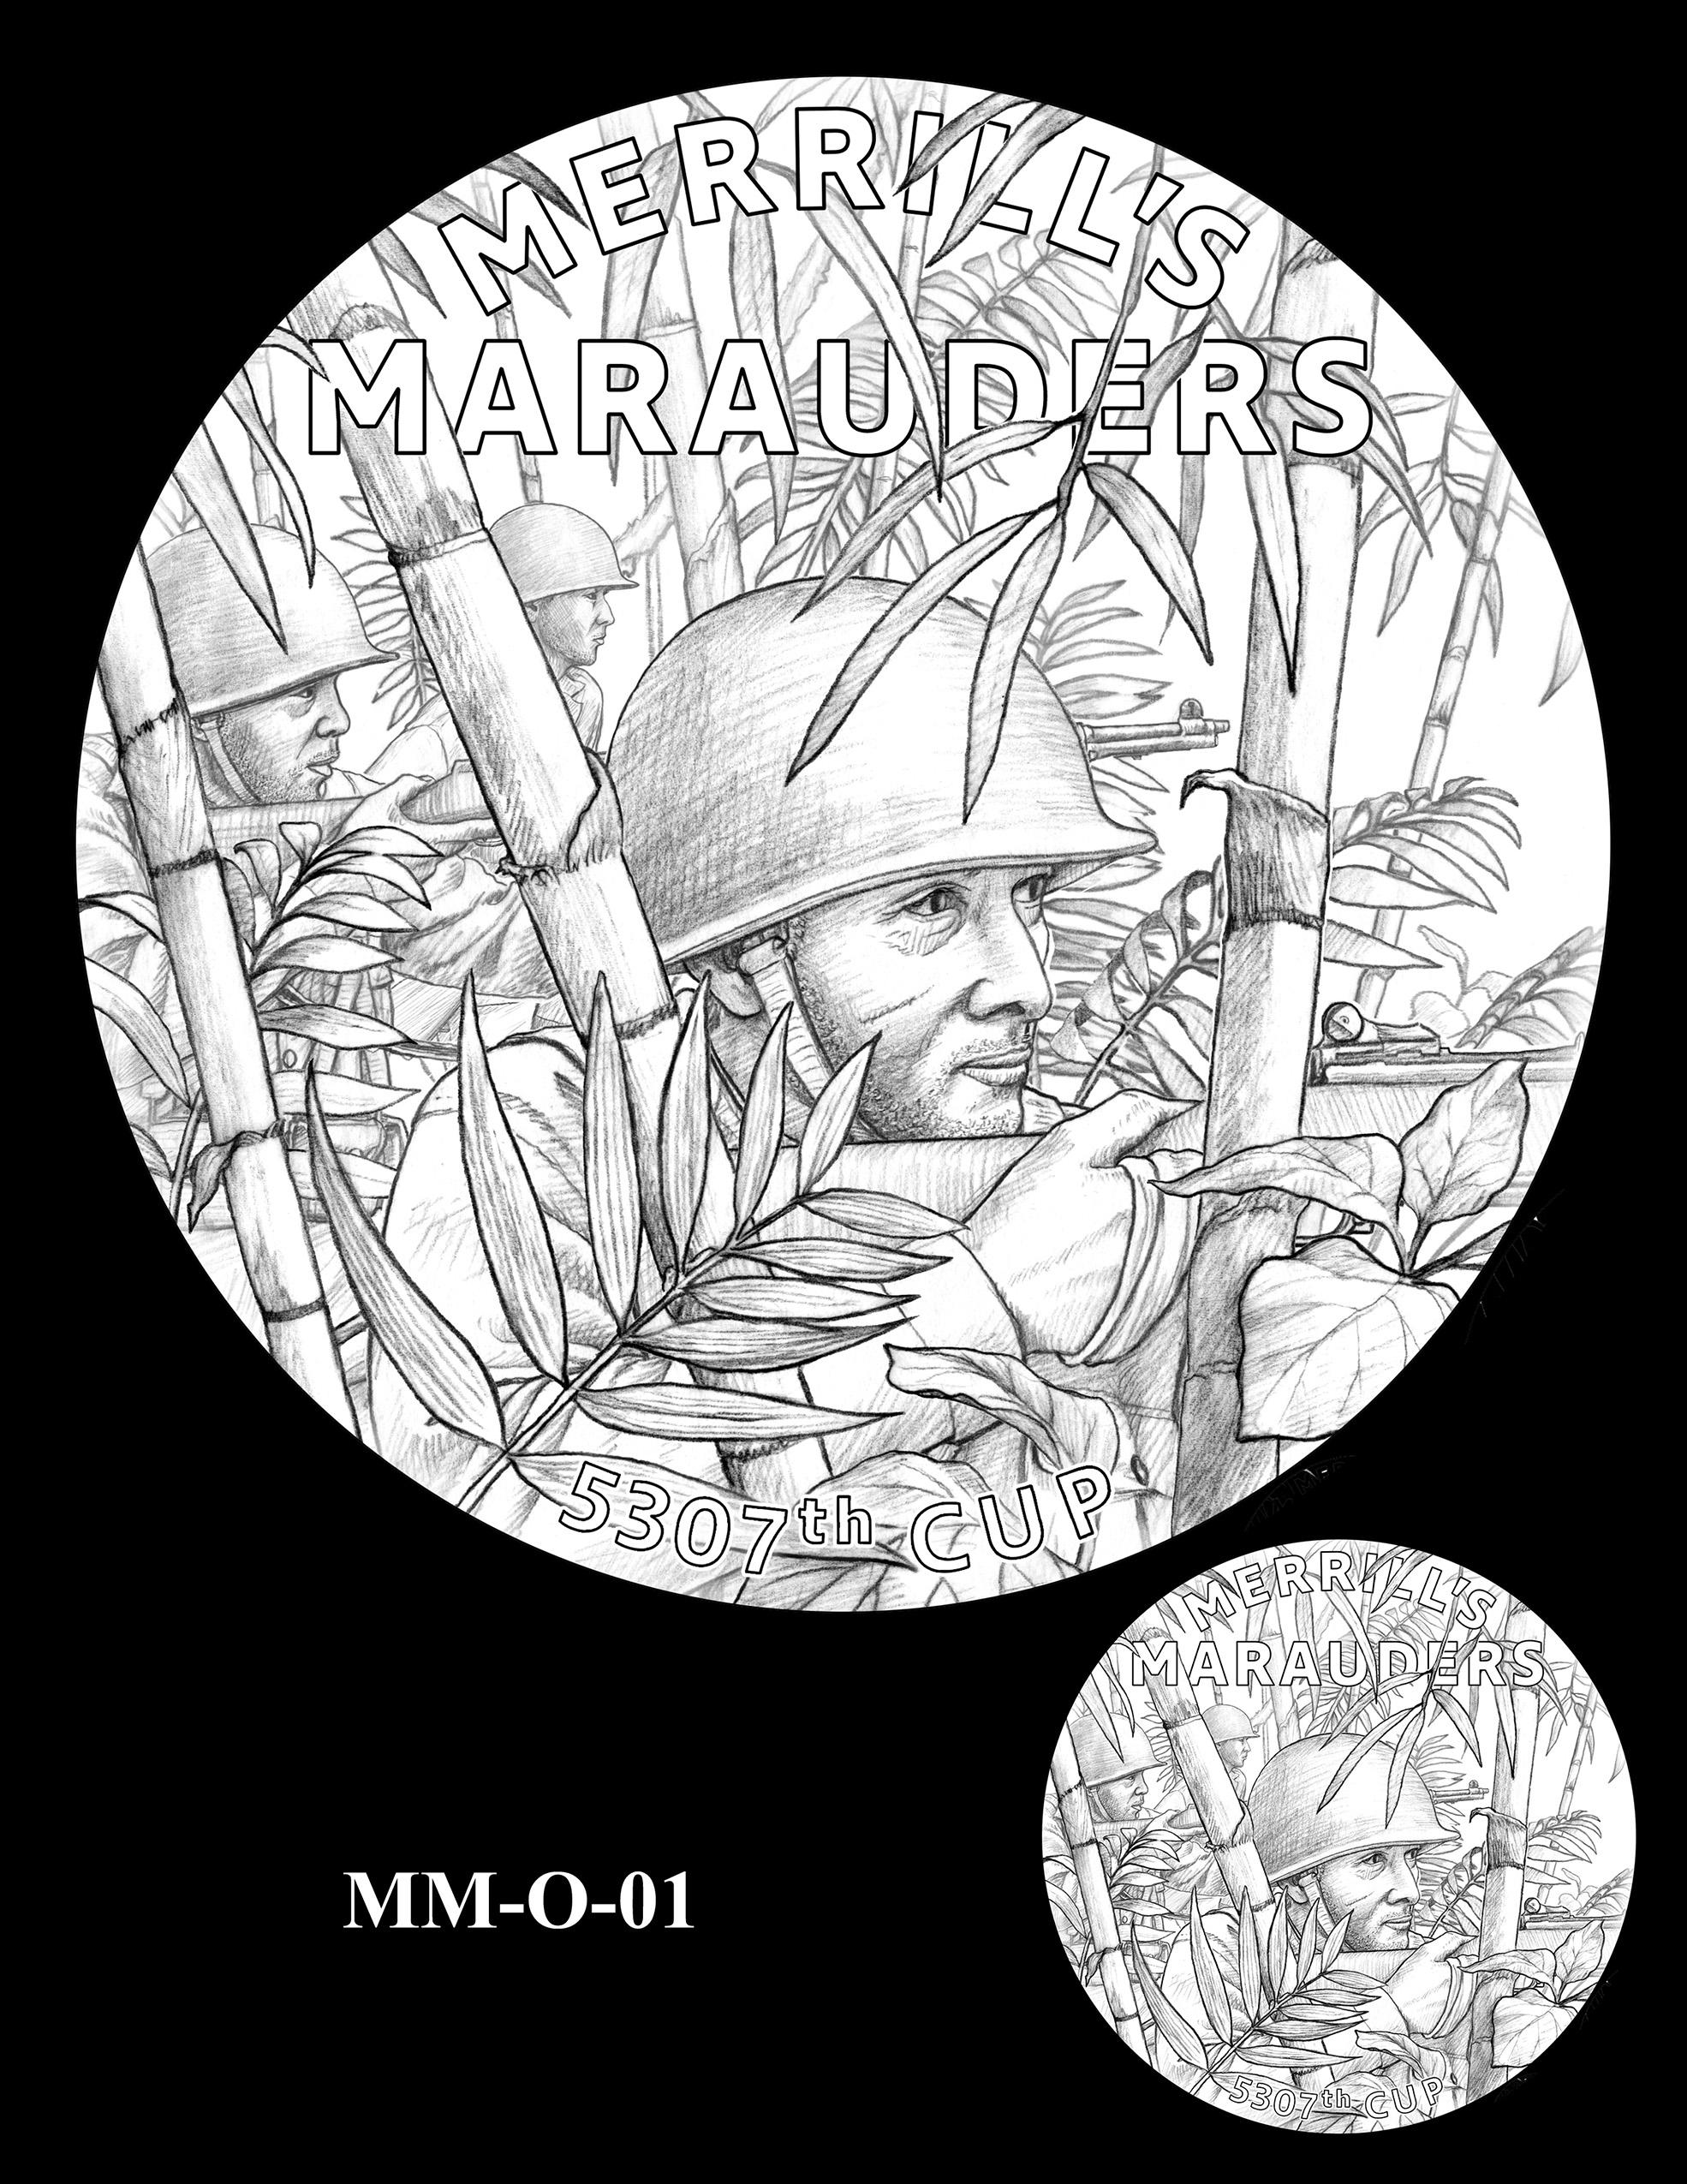 MM-O-01 -- Merrill's Marauders Congressional Gold Medal